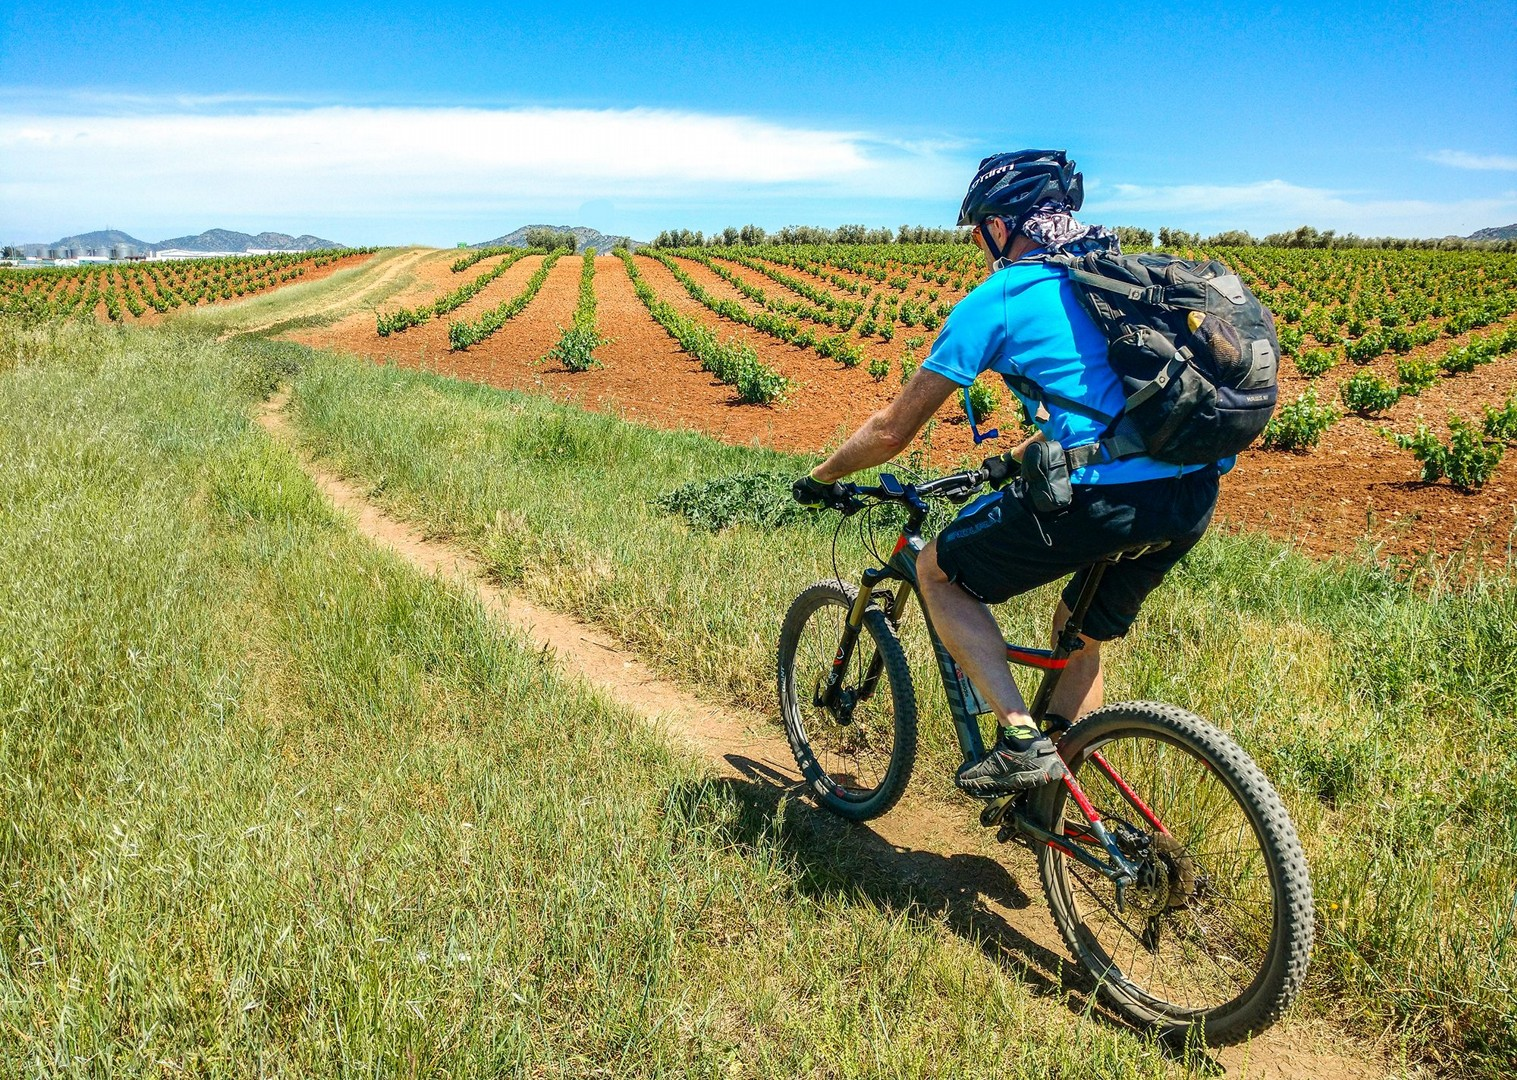 IMG_20170509_130758215.jpg - Spain - Ruta de la Plata - Guided Mountain Bike Holiday - Mountain Biking